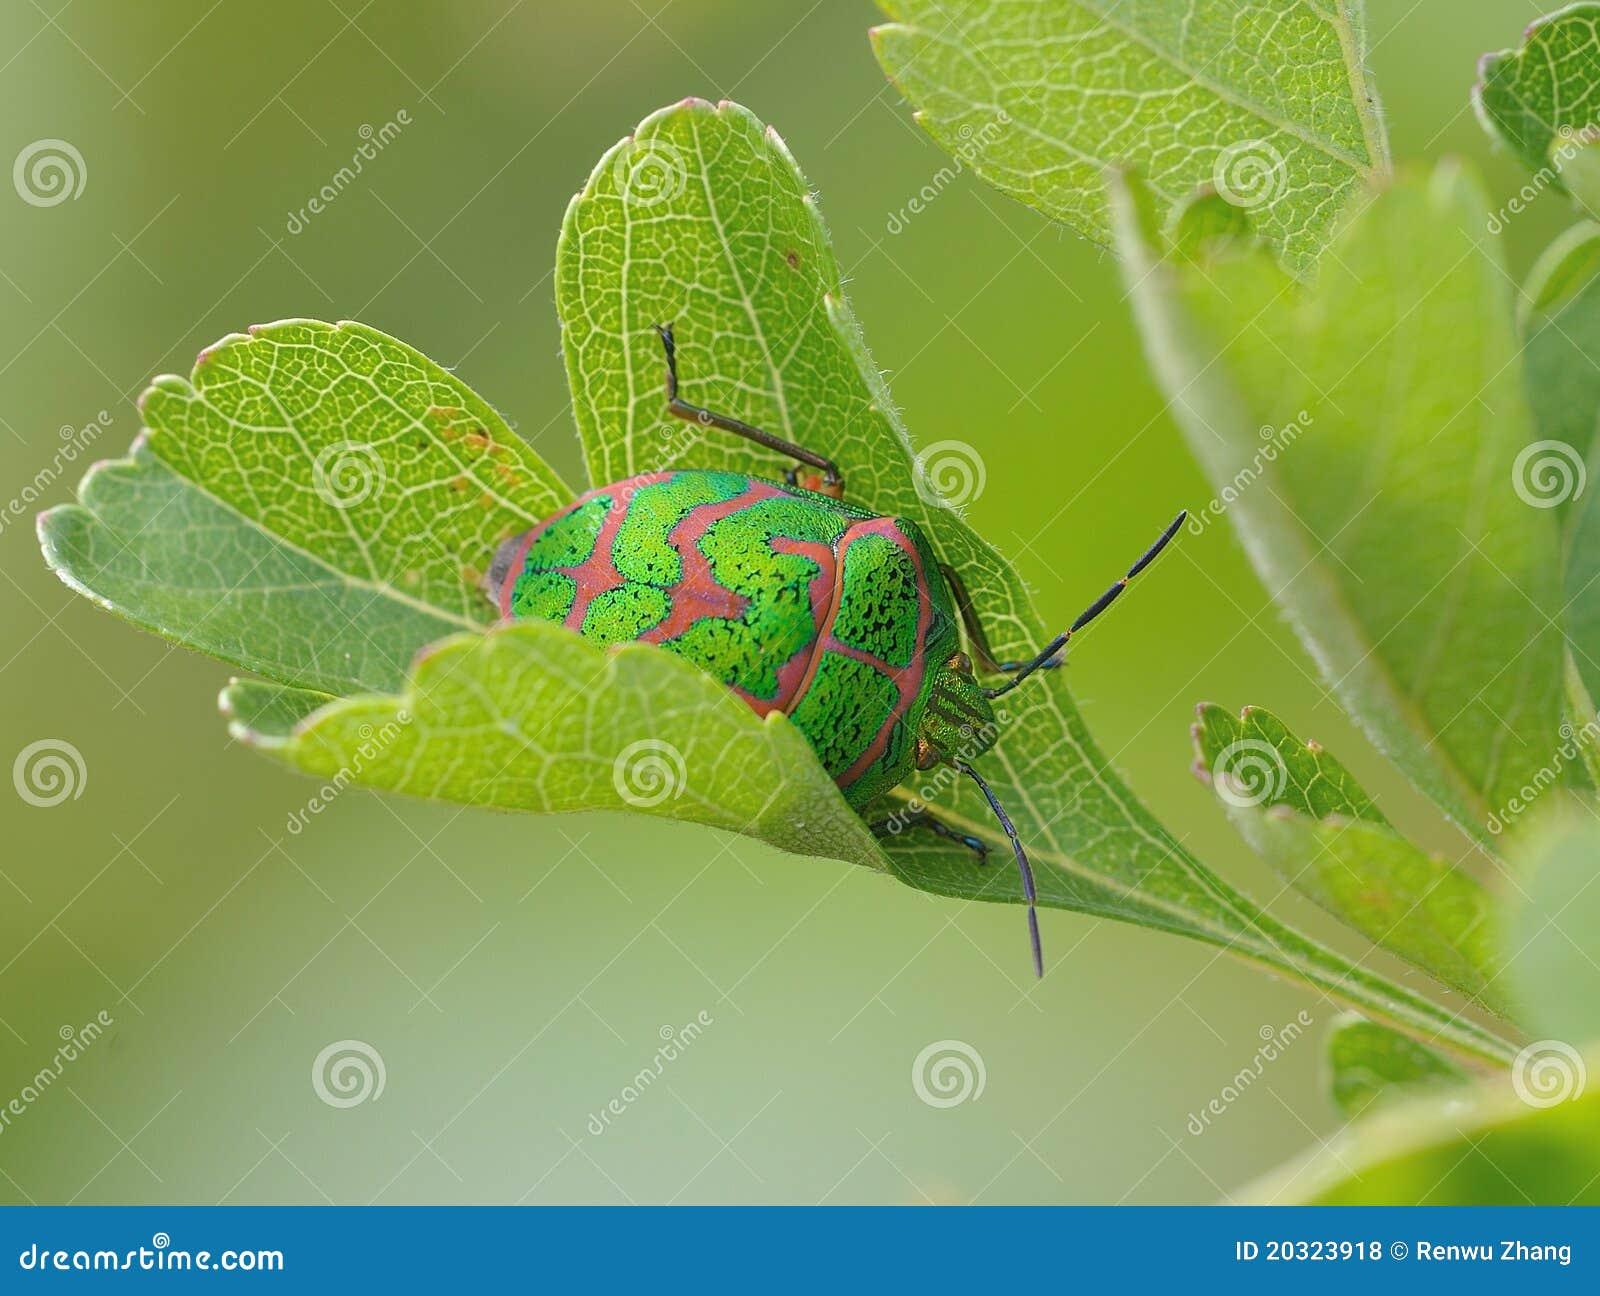 Scutelleridae Royalty Free Stock Photos - Image: 20323918